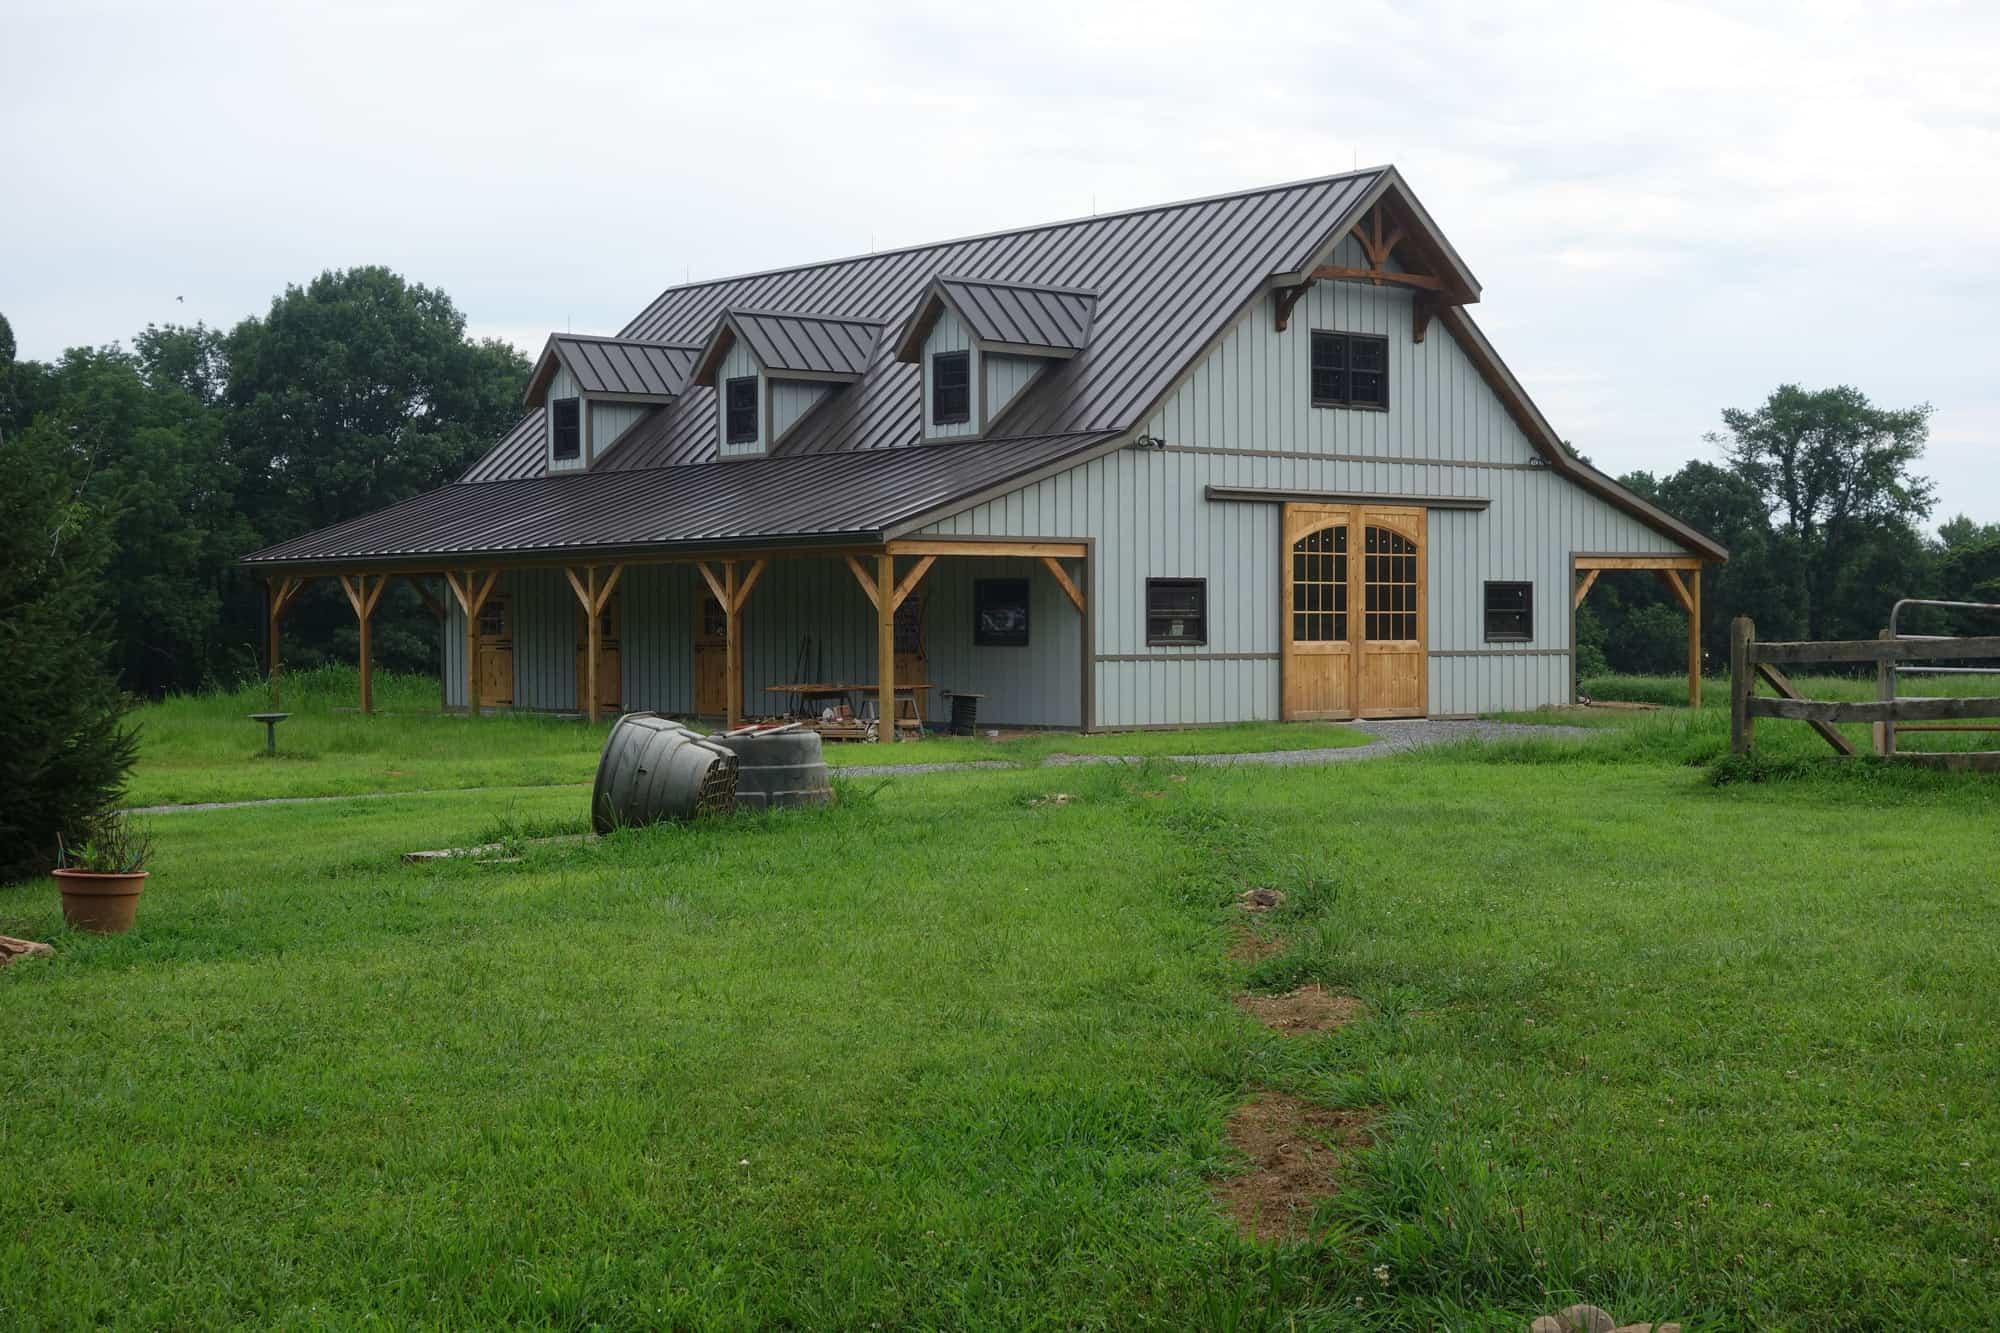 mass timber dormer windows metal roof barndo horse stalls